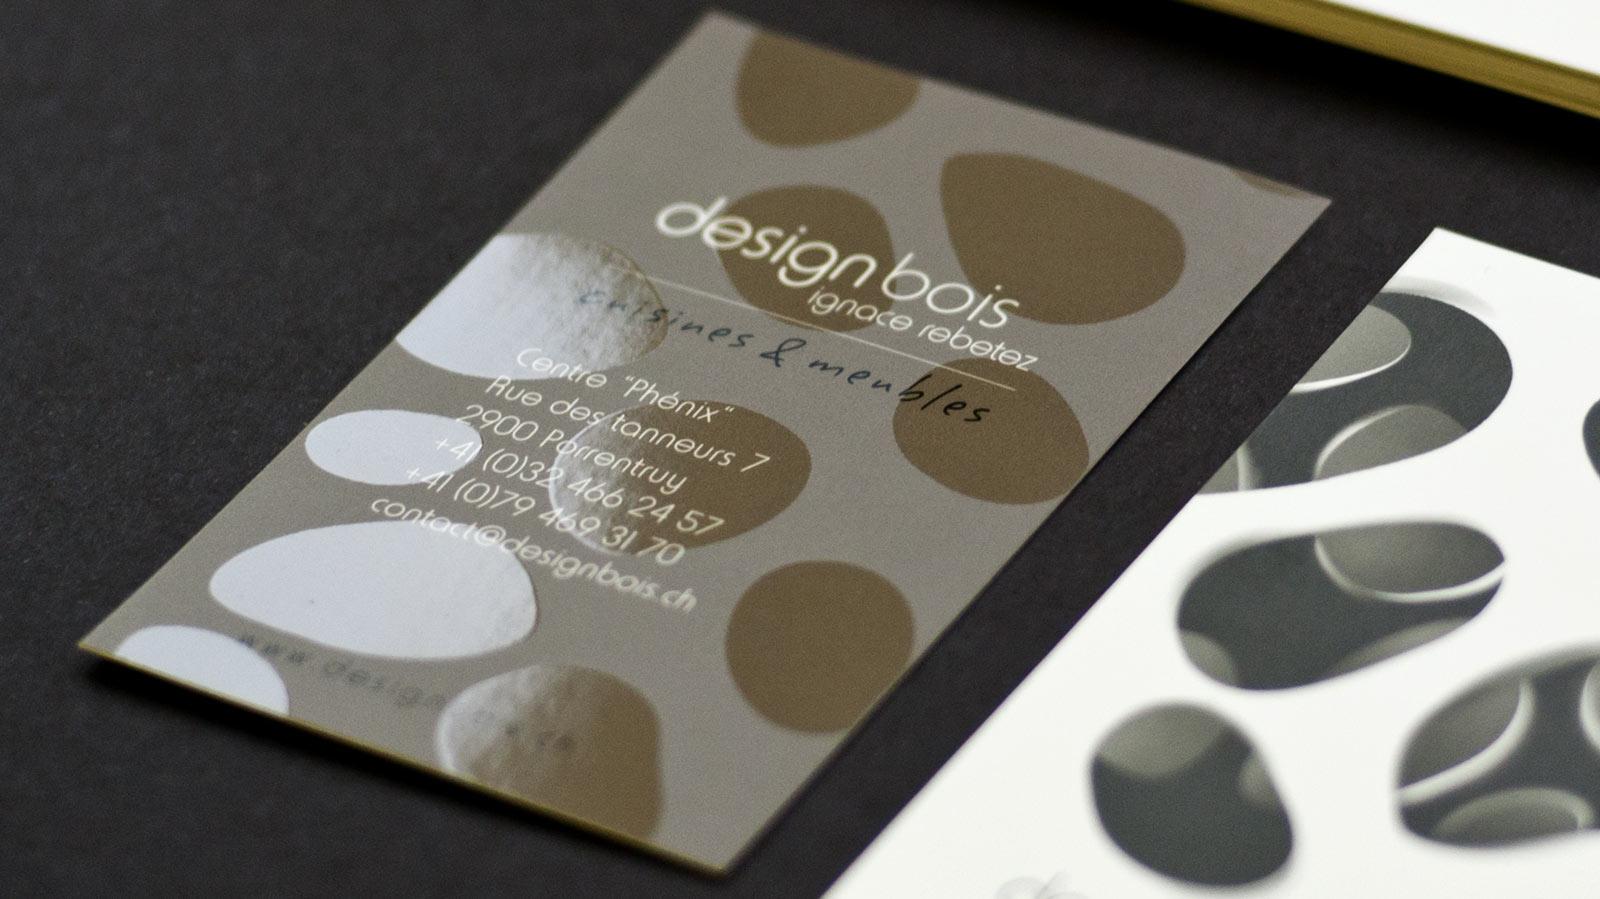 Design Bois Ignace Rebetez